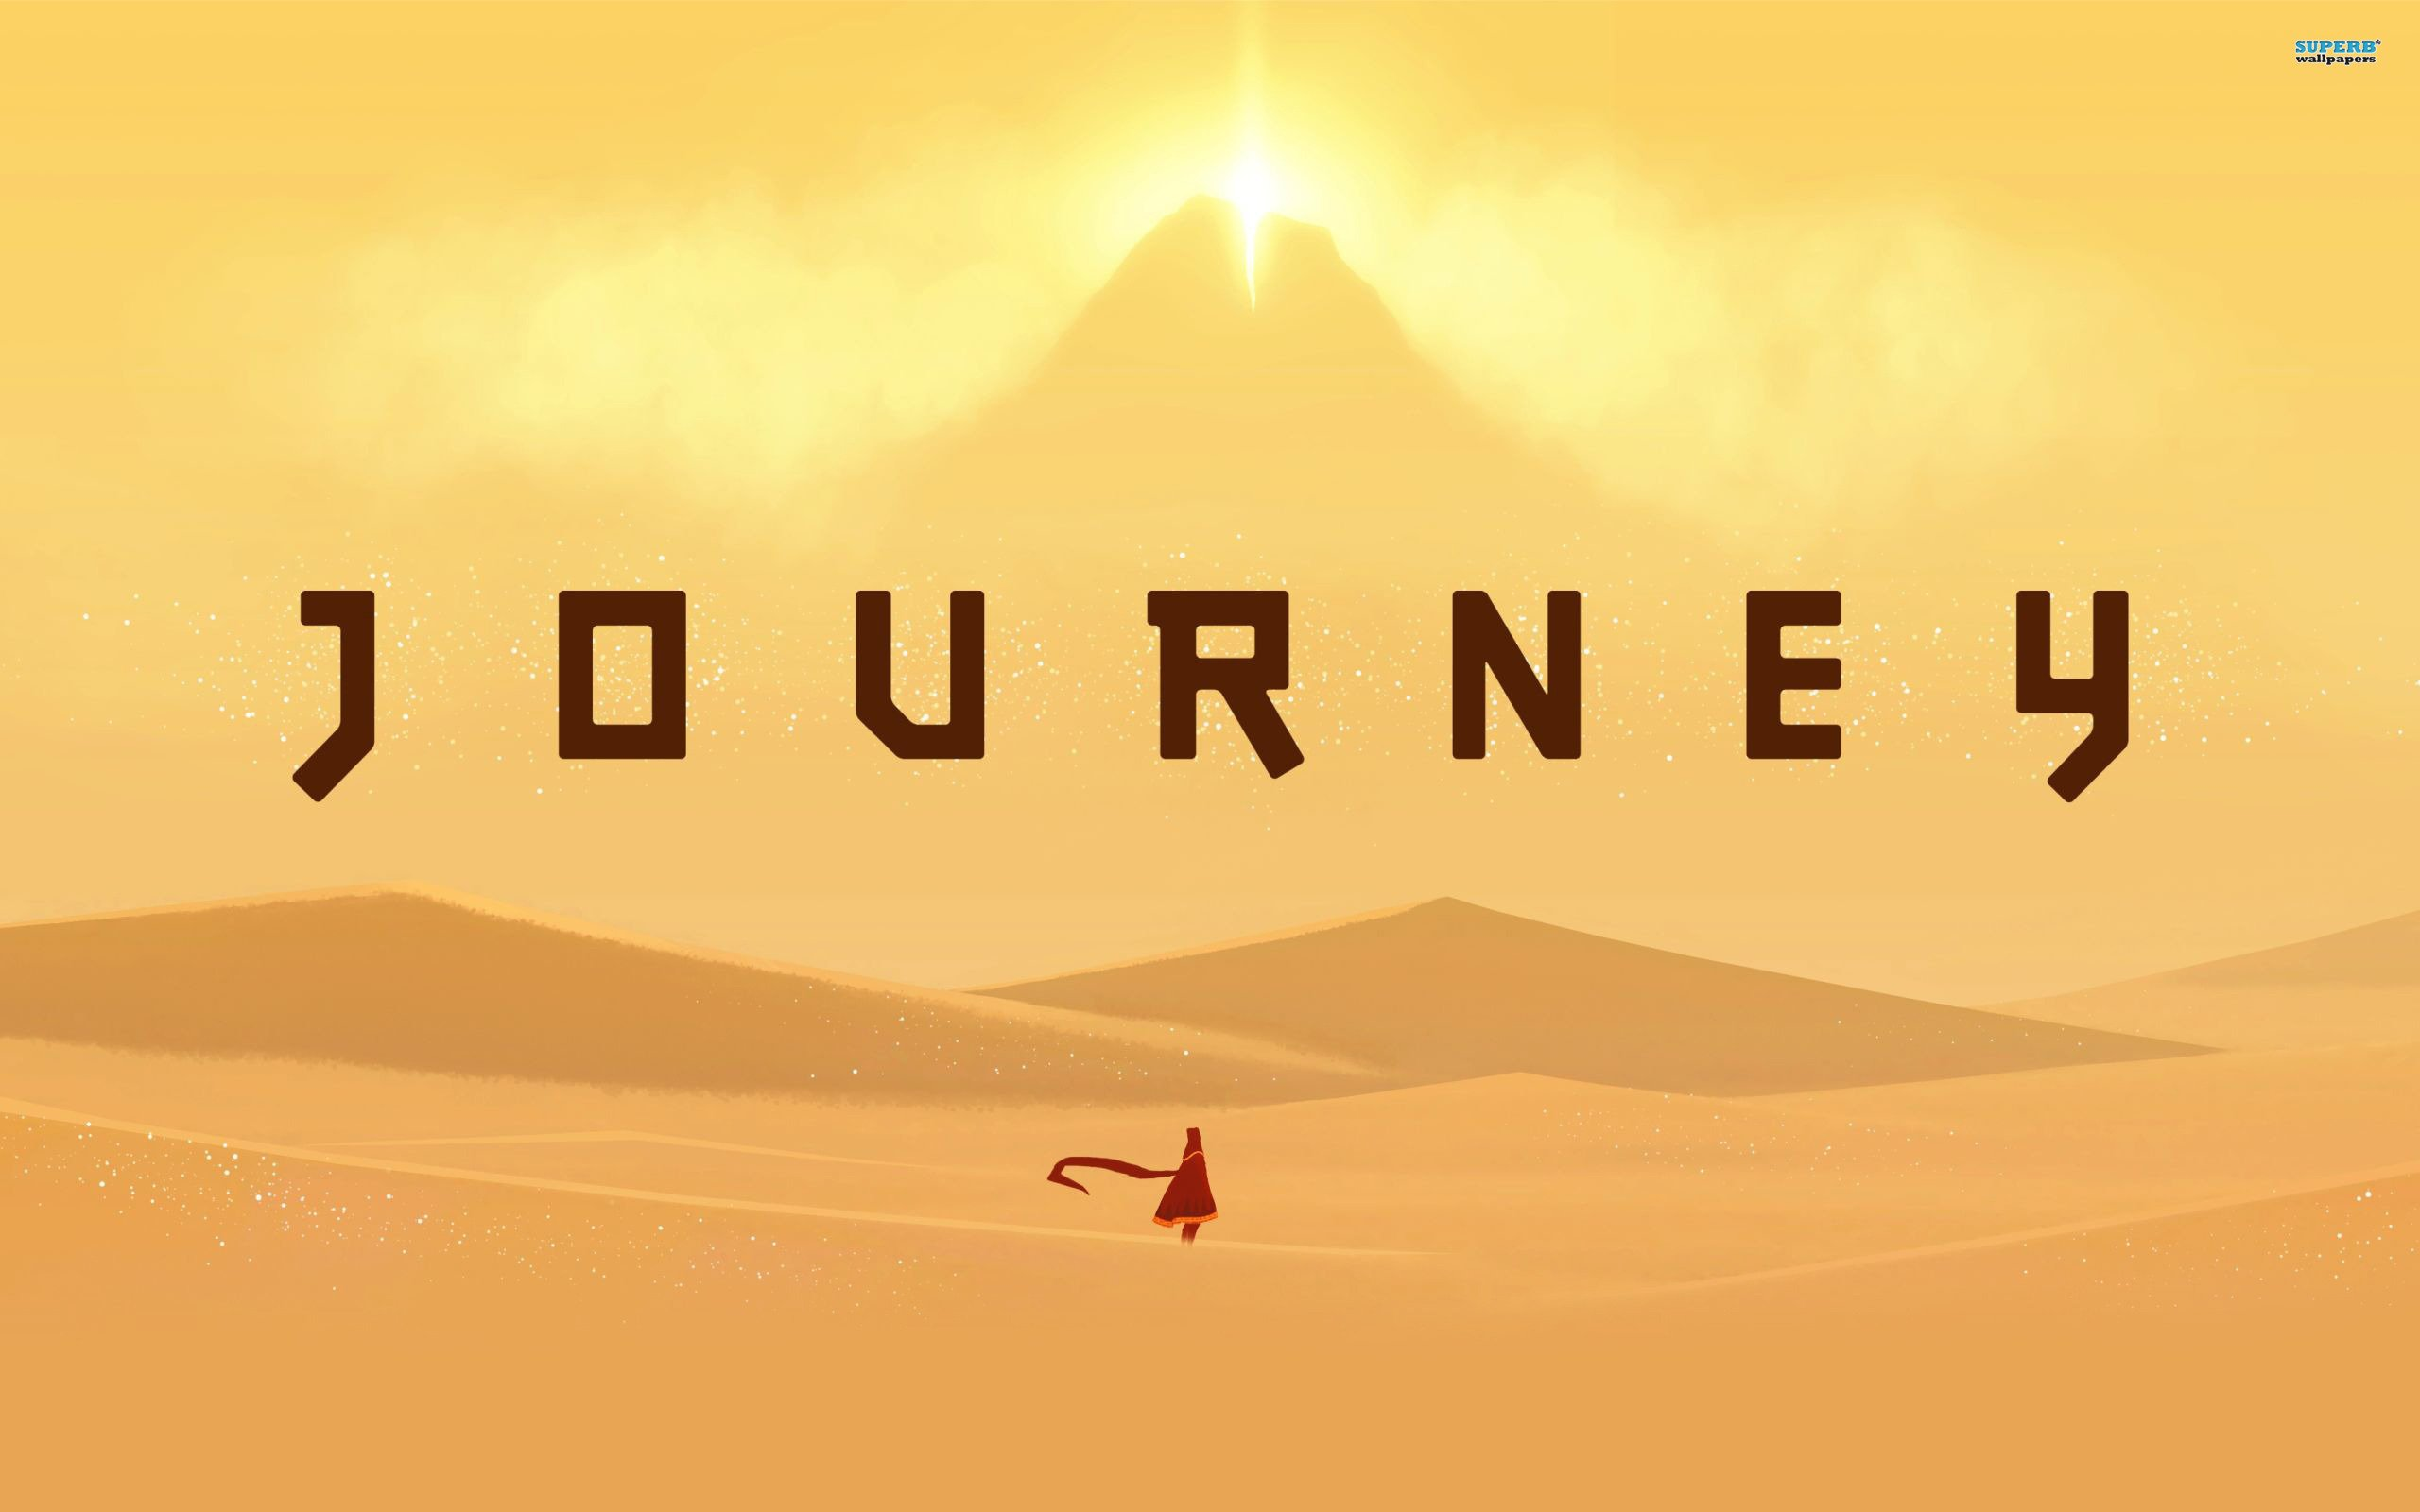 Bible Quotes Wallpaper Download Journey Indie Fantasy Adventure Family Cartoon 53